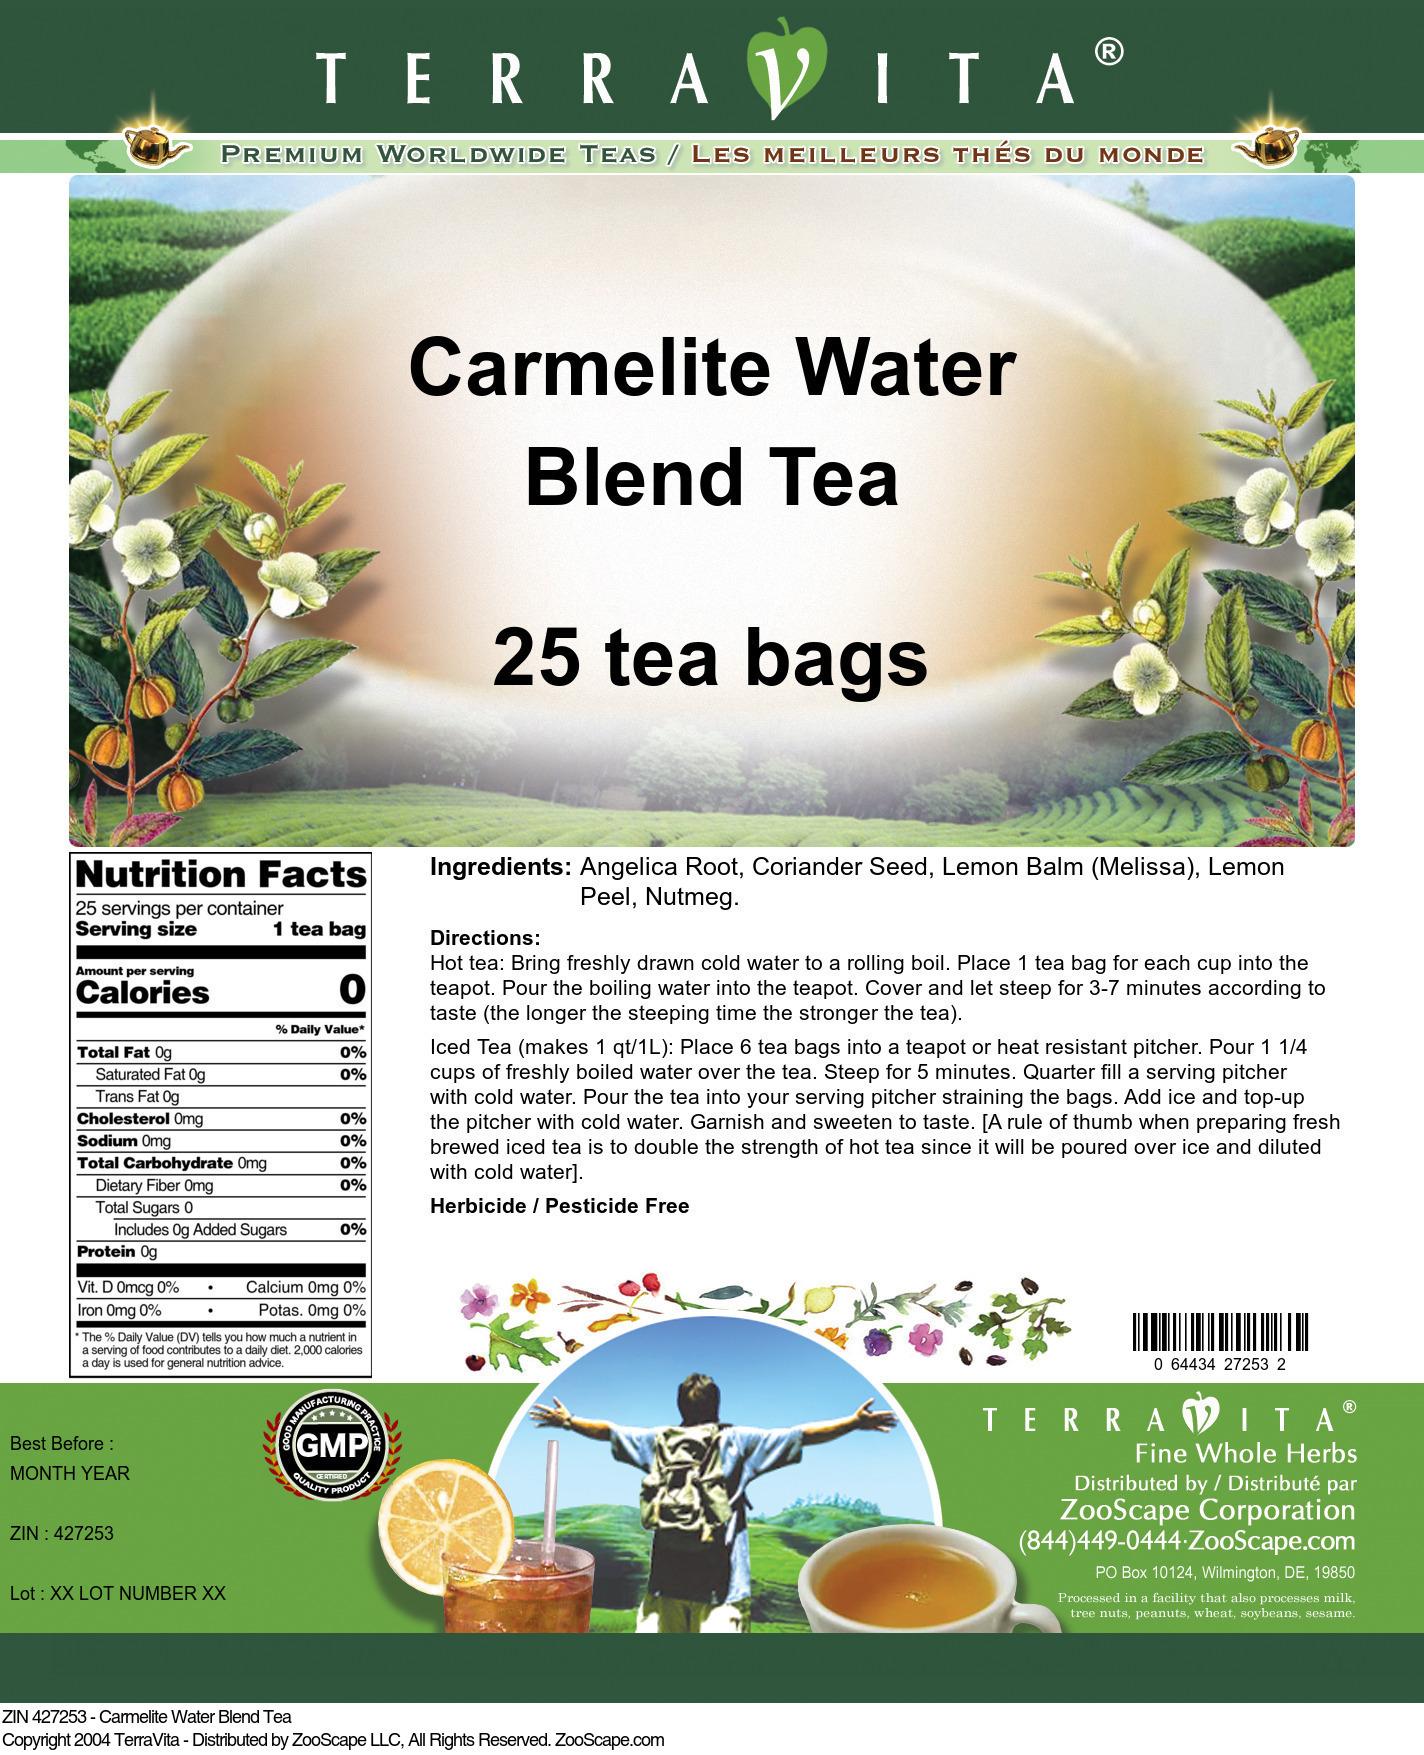 Carmelite Water Blend Tea